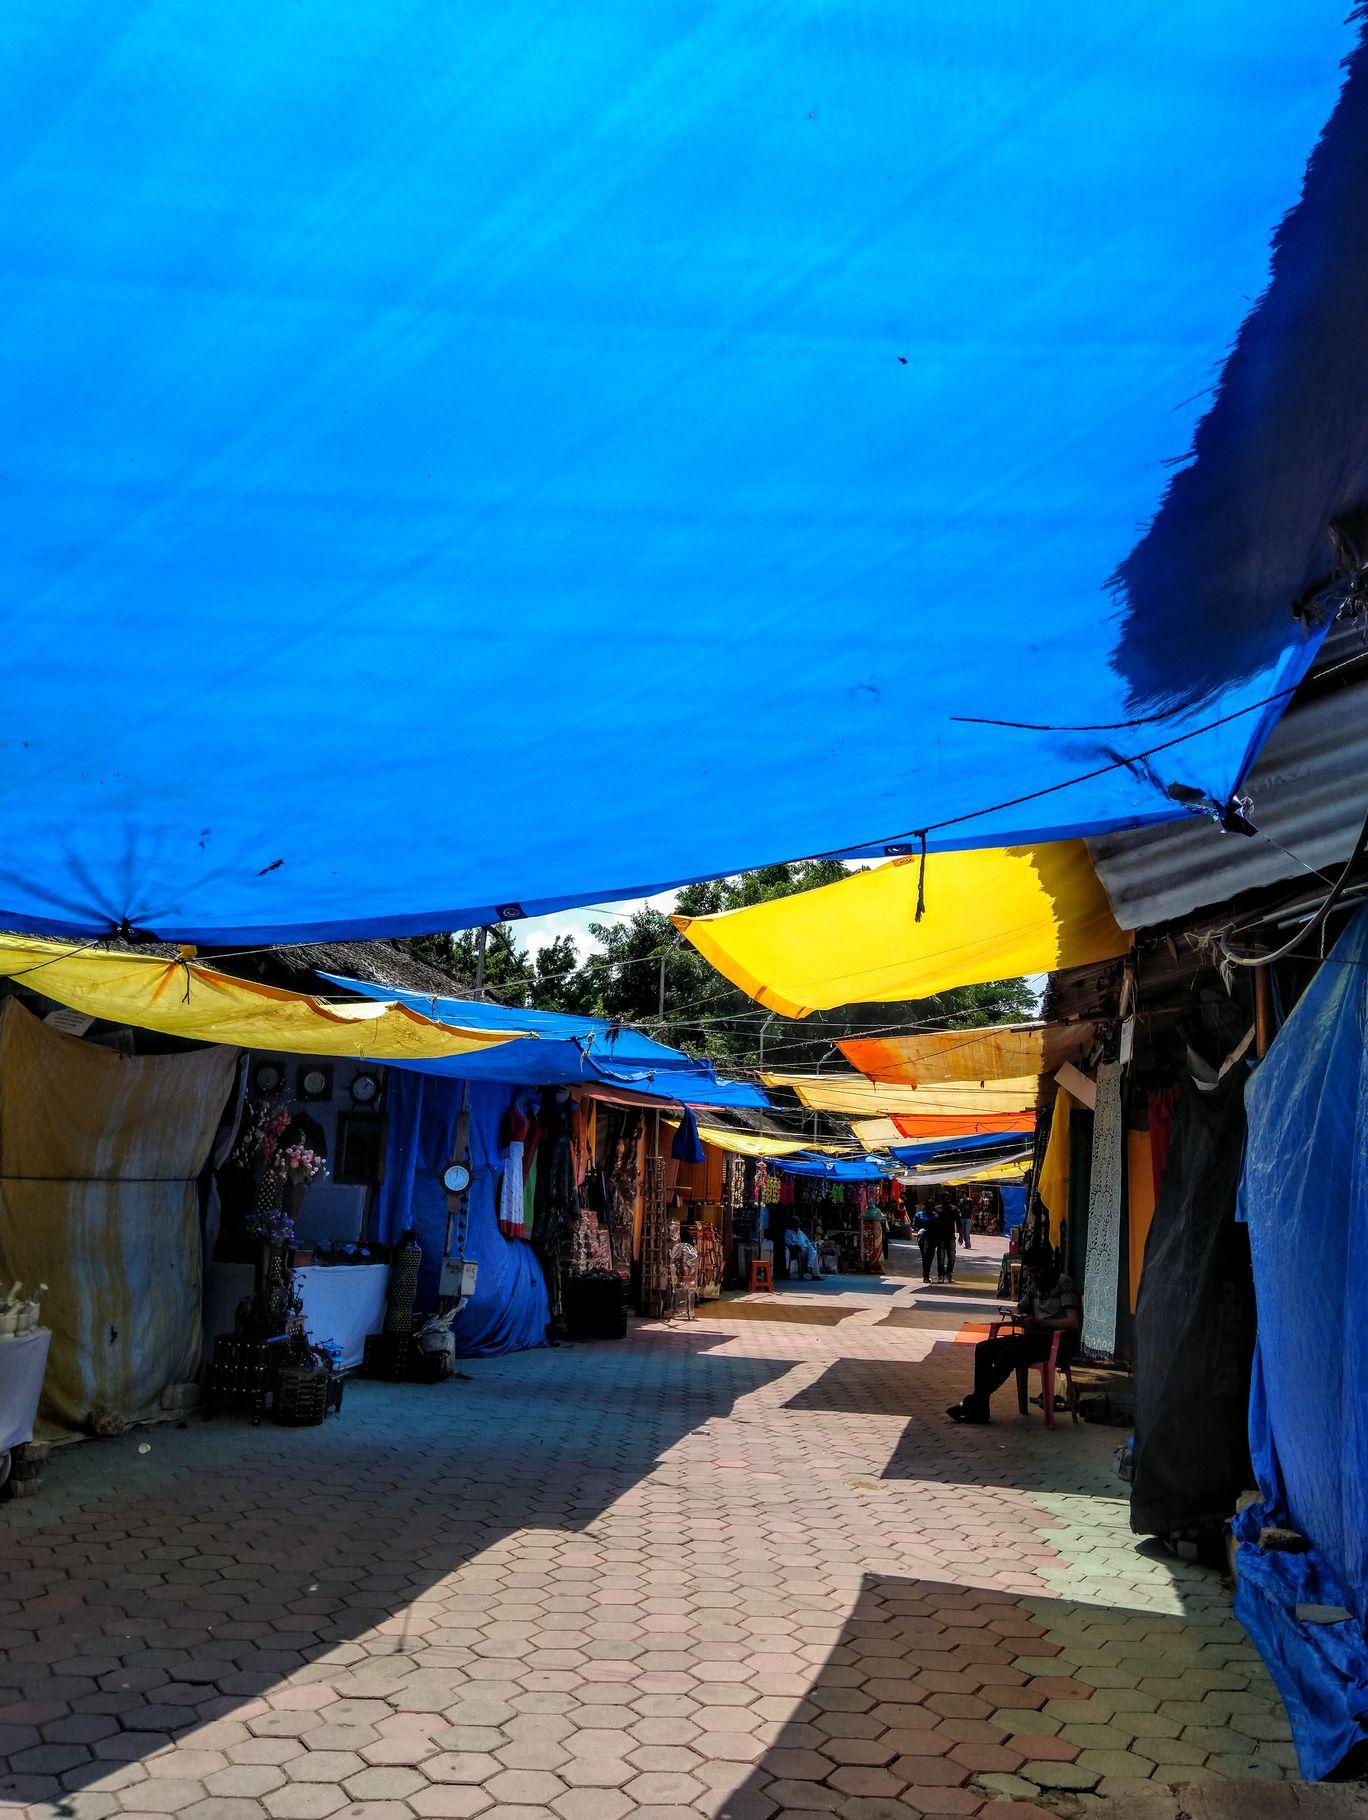 Photo of Hyderabad By Apratim Kundu